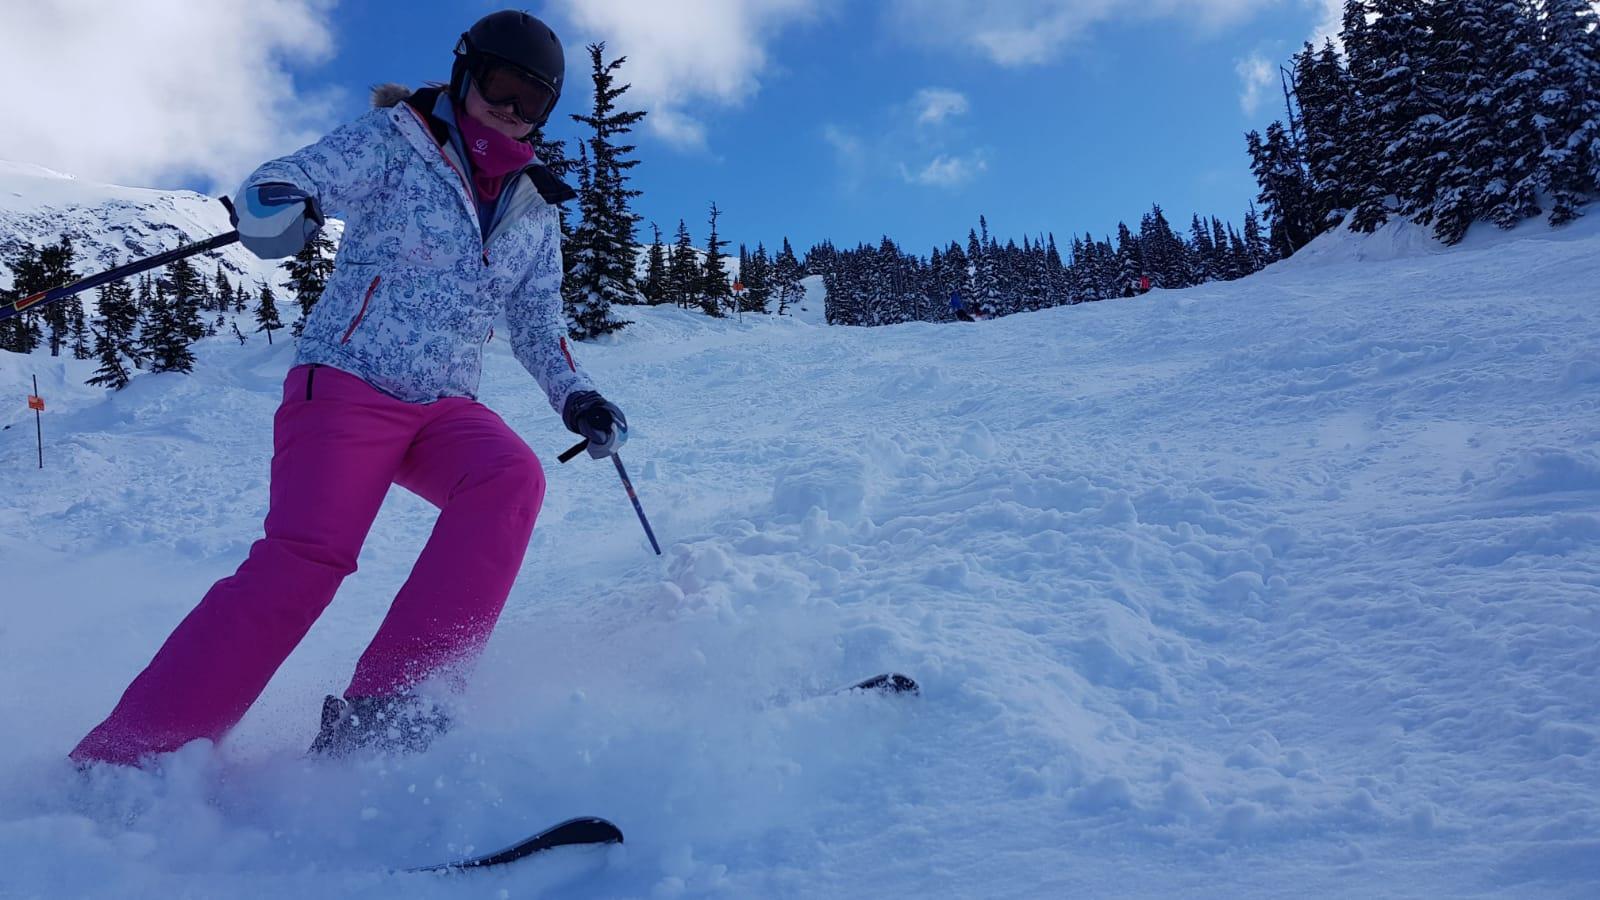 Kathy skiing down the mountainside